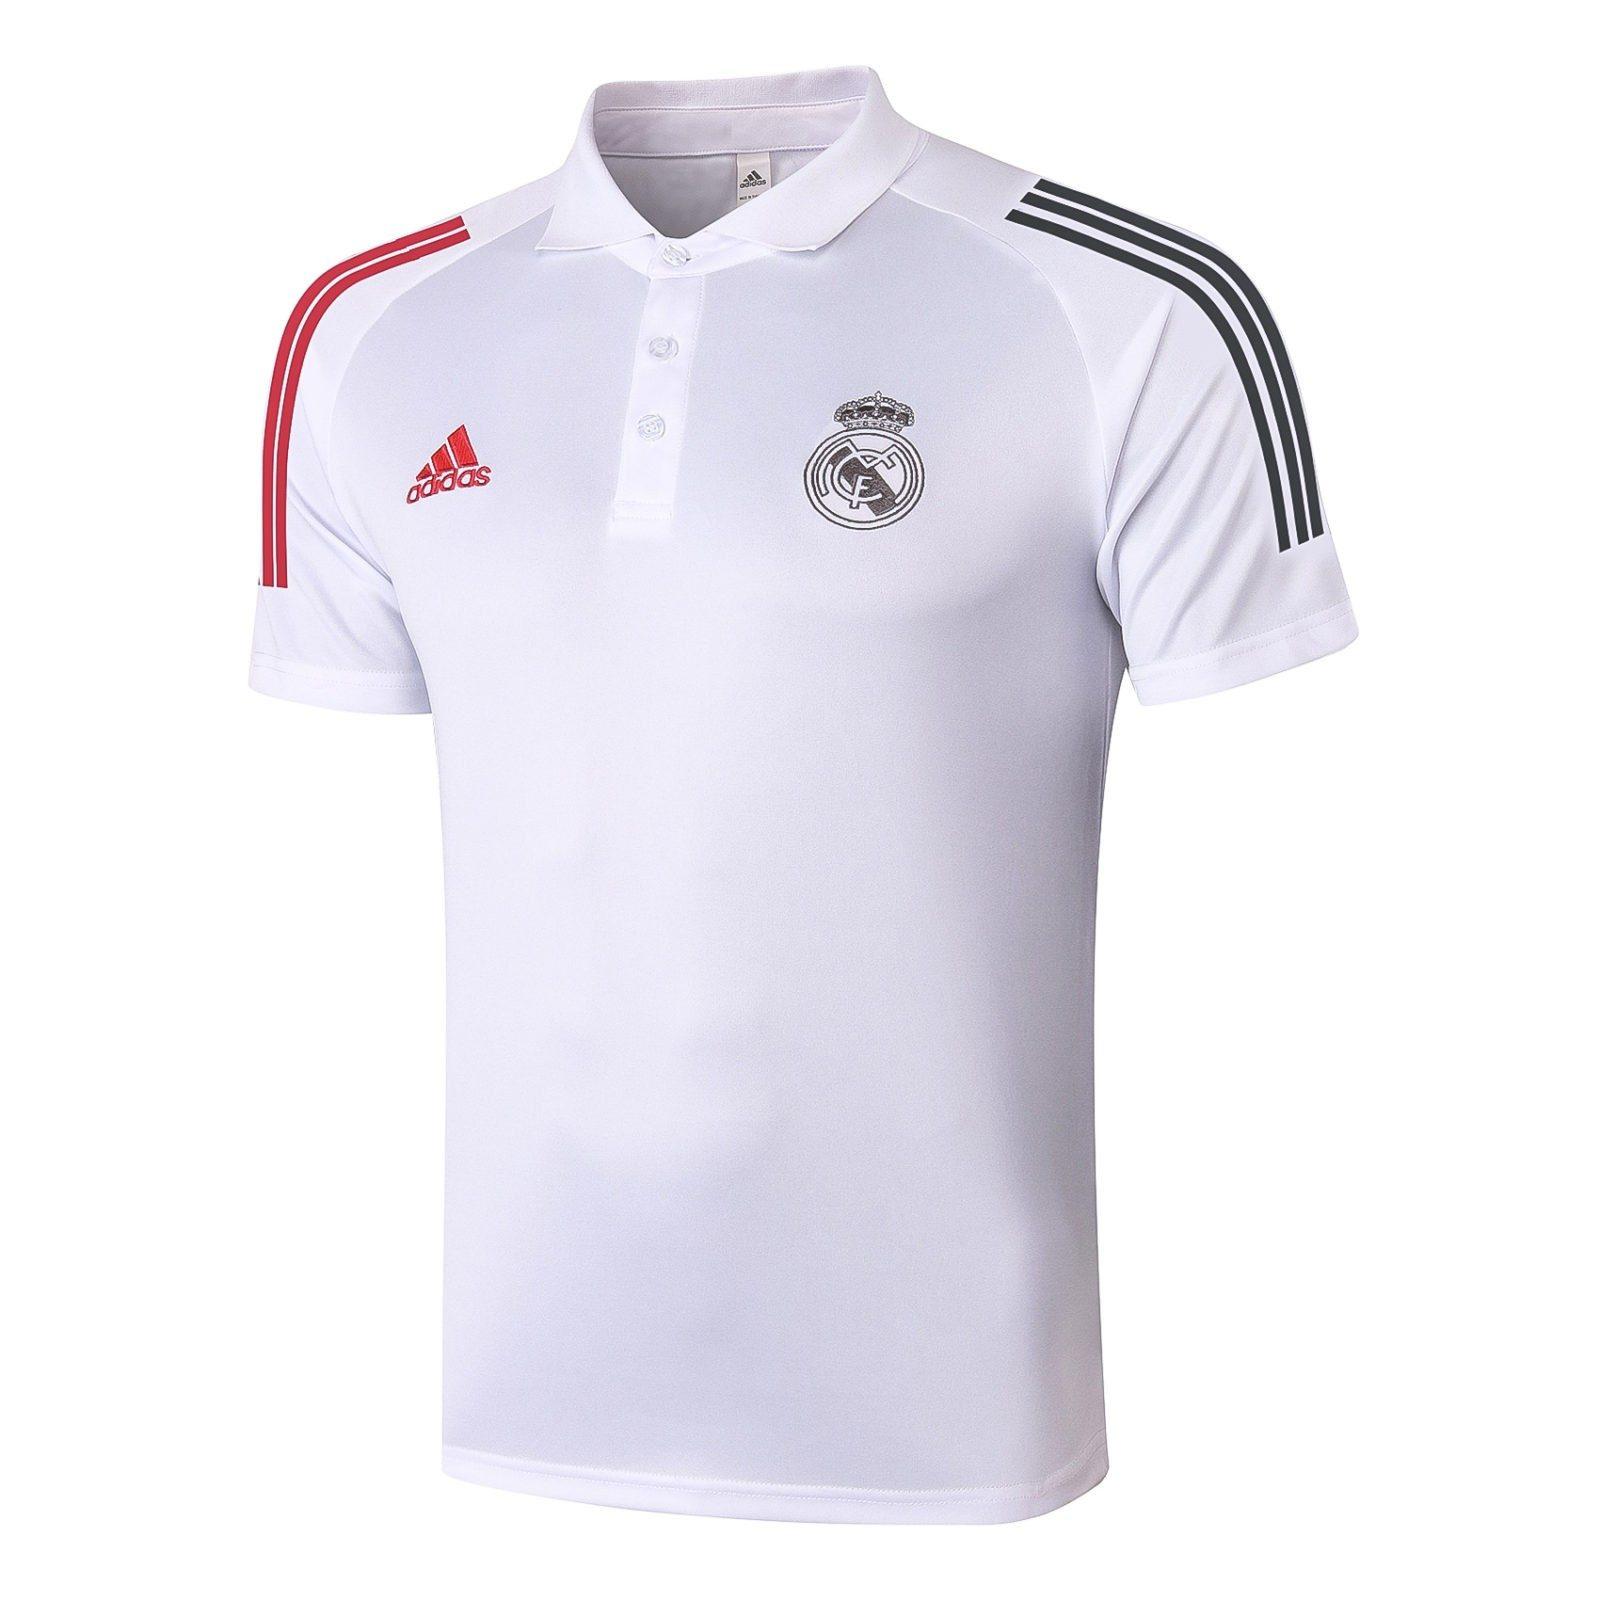 Футболка поло Реал Мадрид сезон 2020-2021 (белая)